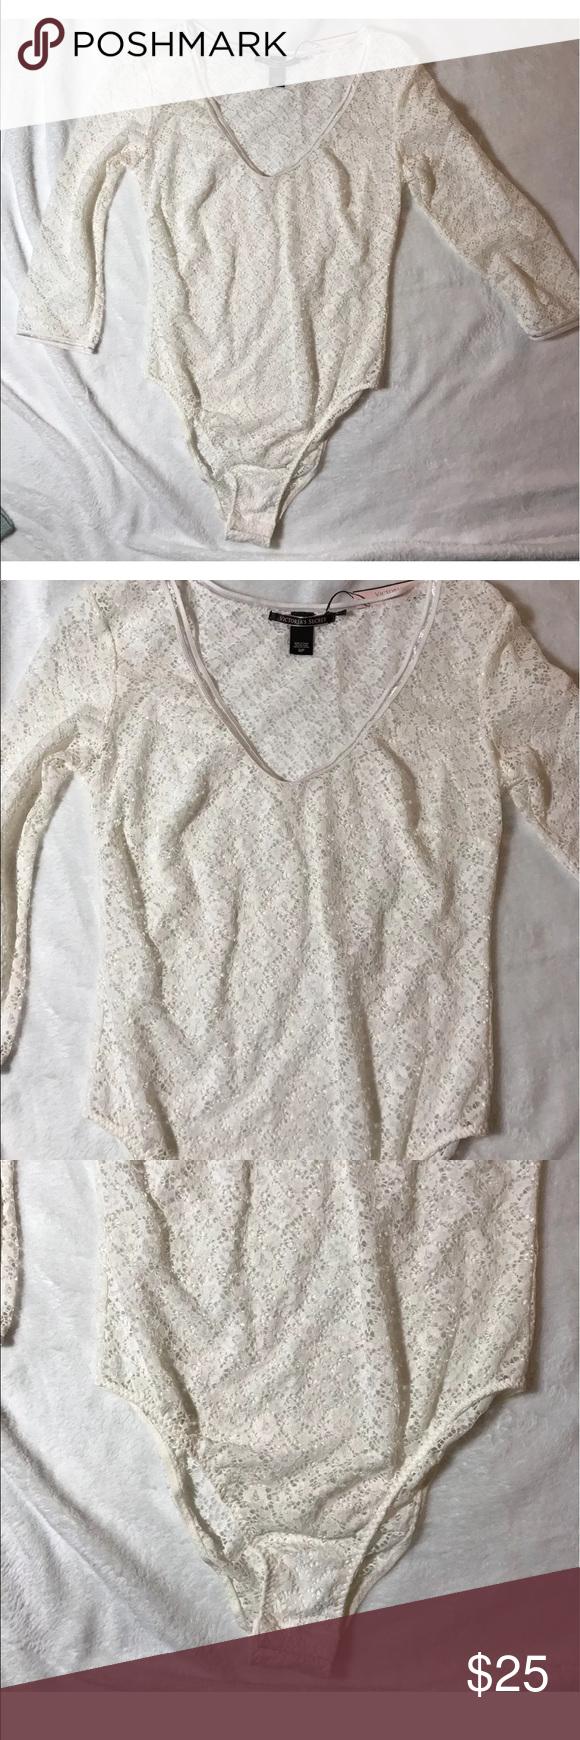 "Nwt Victoria's Secret white lace bodysuit New with tags Victoria's Secret Size Small White stretch Lace Snaps at crotch  16"" under arms across the back Victoria's Secret Tops"